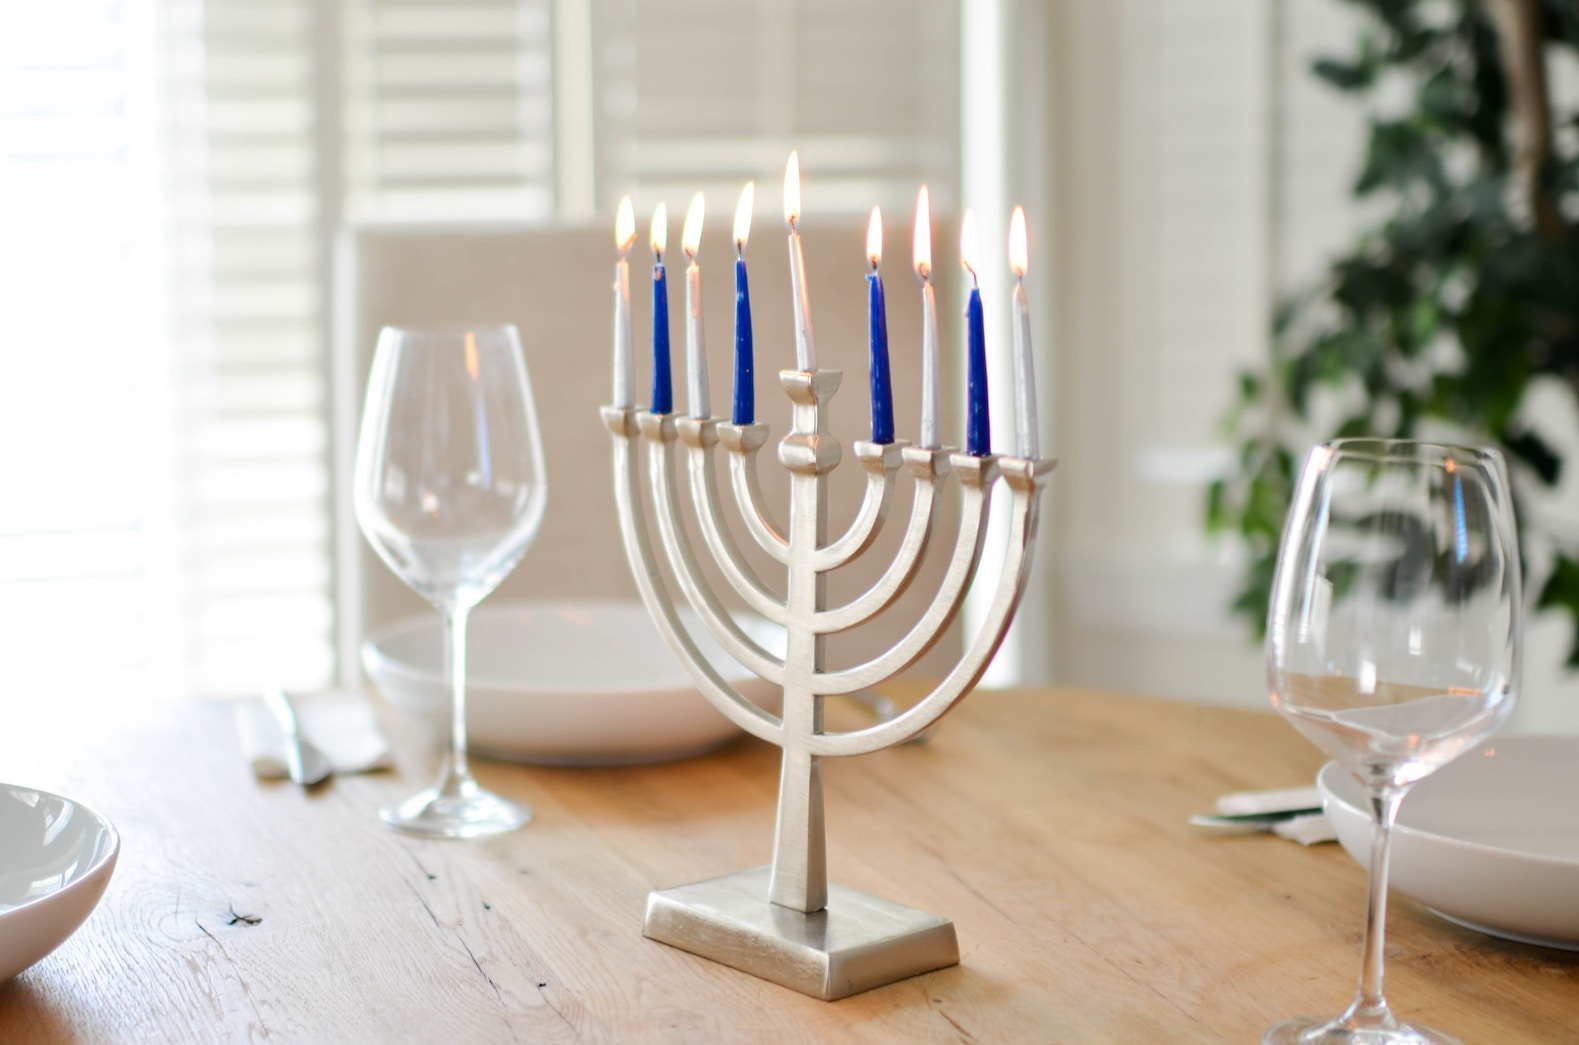 7 Simple Steps for the Ultimate Vegan Hanukkah Celebration